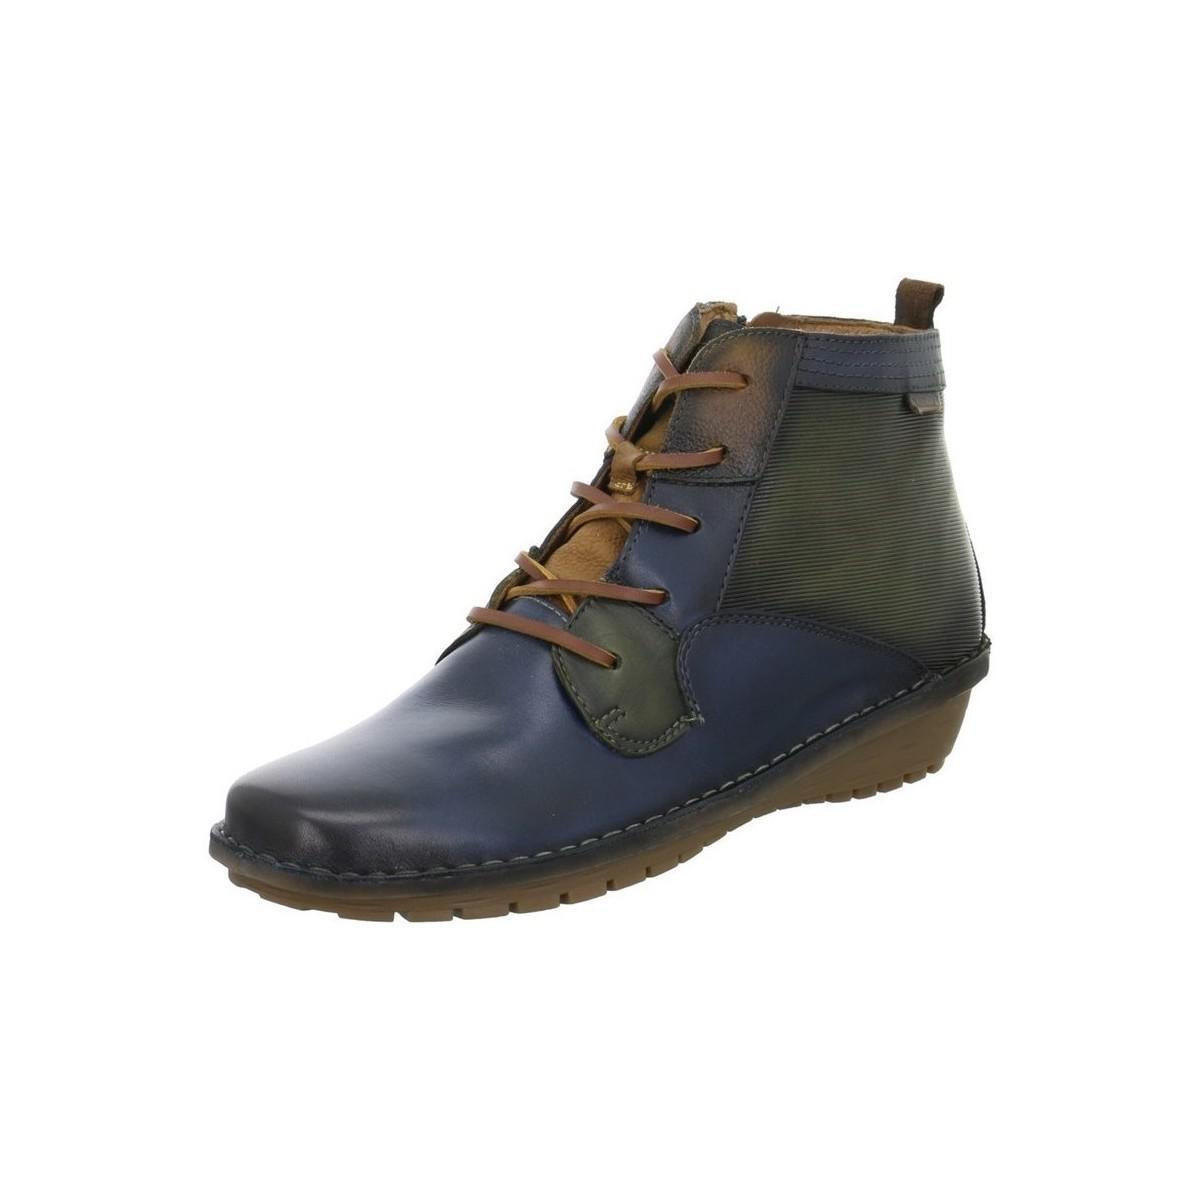 Pikolinos Wabana Keil women's Low Ankle Boots in Discount Pre Order 6otAba4f